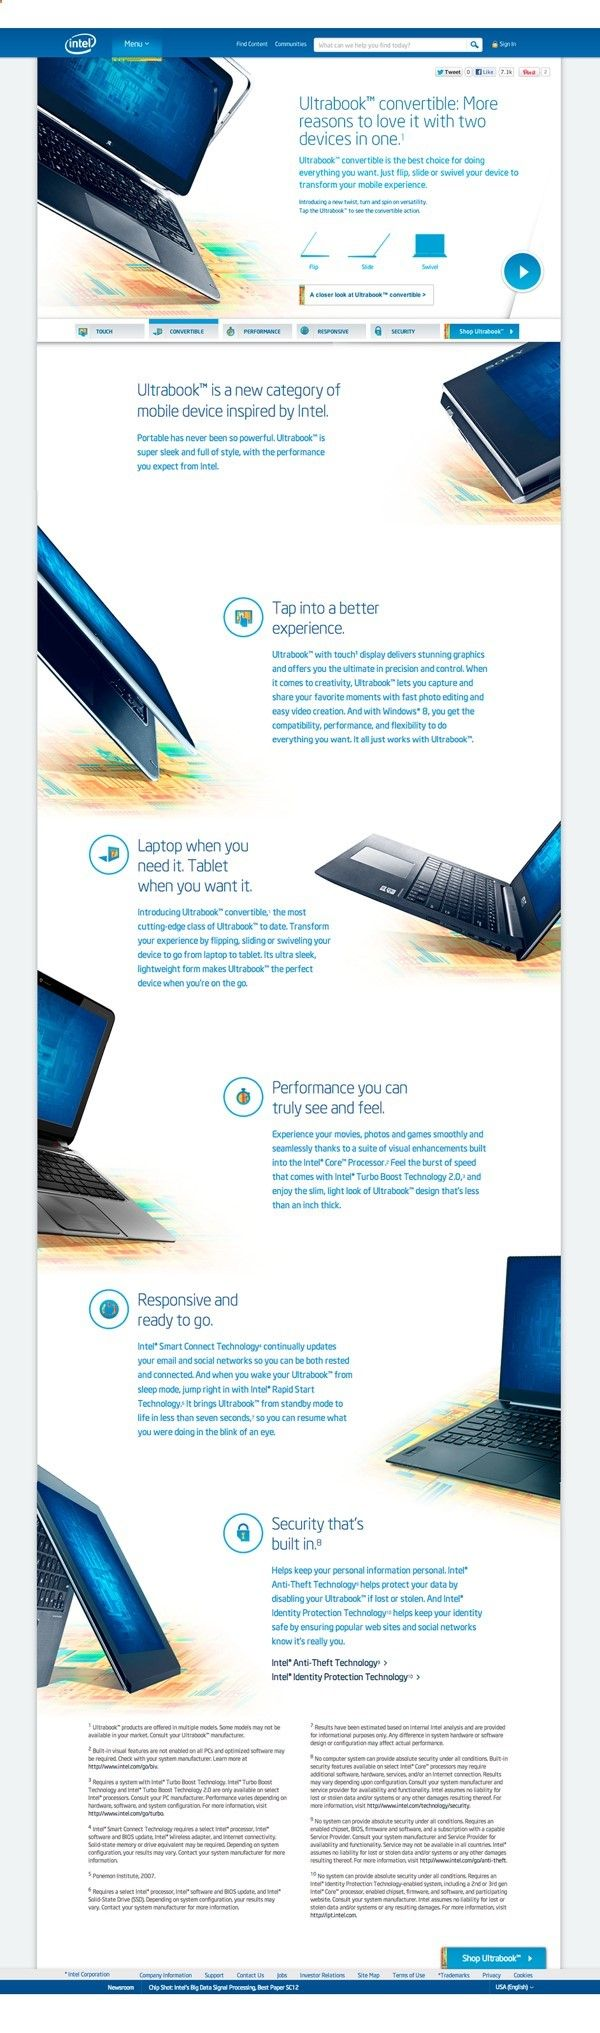 Ultrabook Laptops - Ultrabook Laptops - . - TOP10 BEST LAPTOPS 2017 (ULTRABOOK, HYBRID, GAMES ...)  - TOP10 BEST LAPTOPS 2017 (ULTRABOOK, HYBRID, GAMES ...)